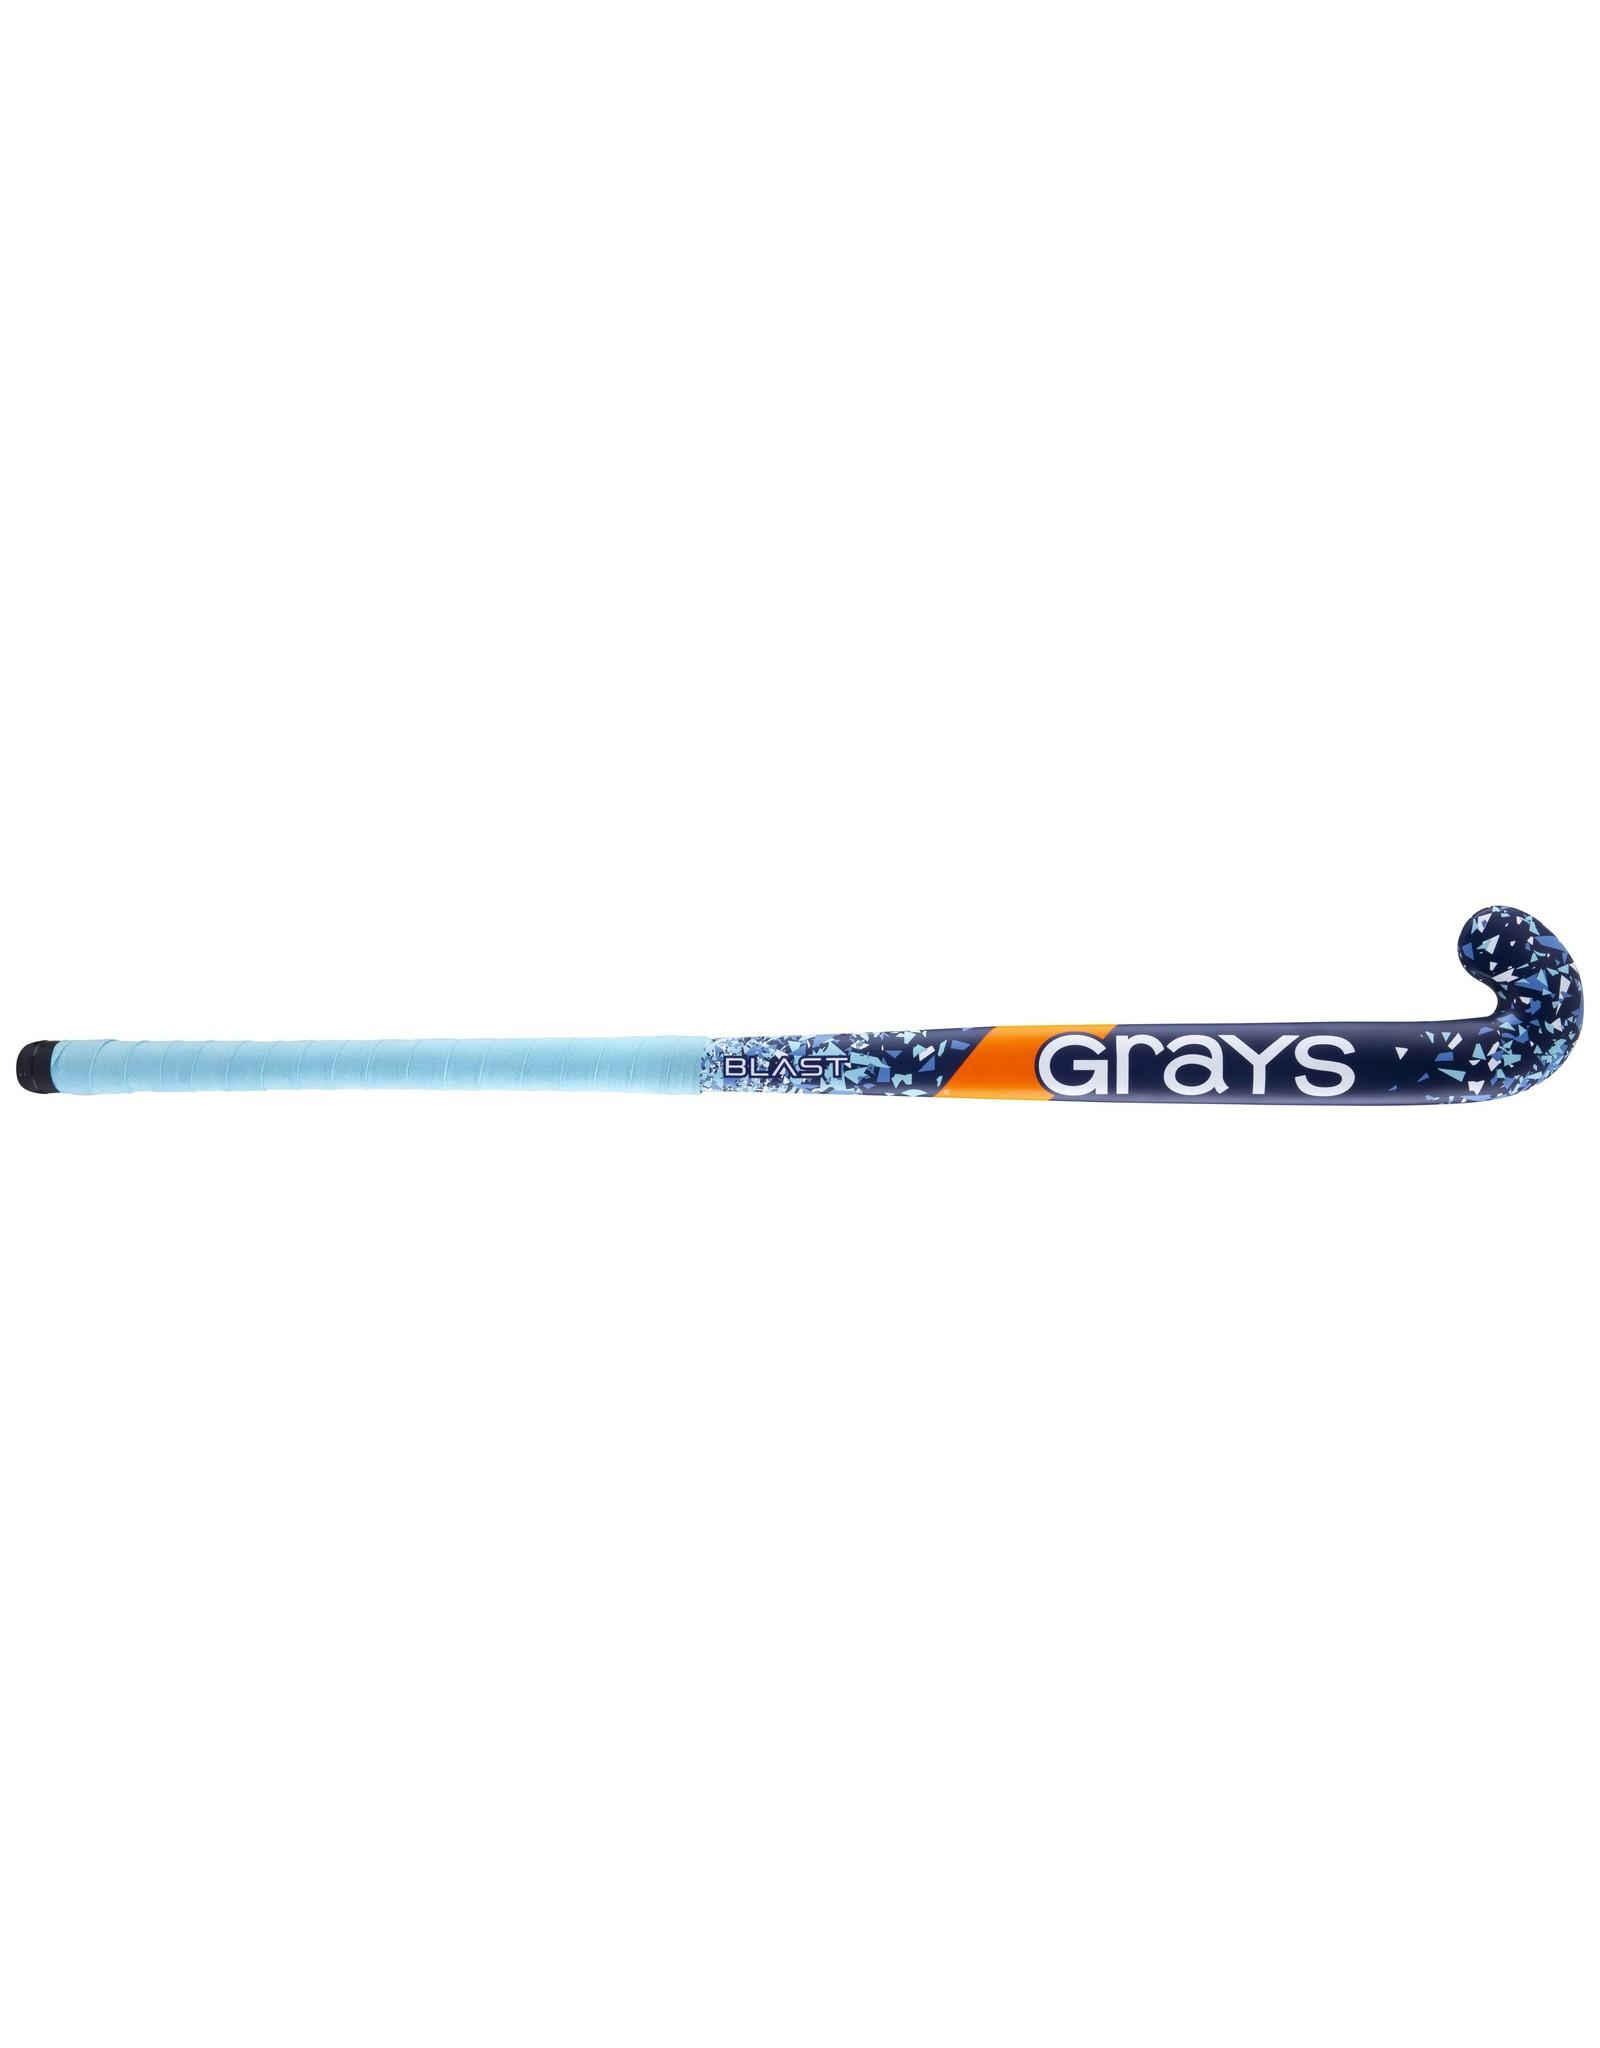 Grays STK BLAST UB MC NAVY/SKY